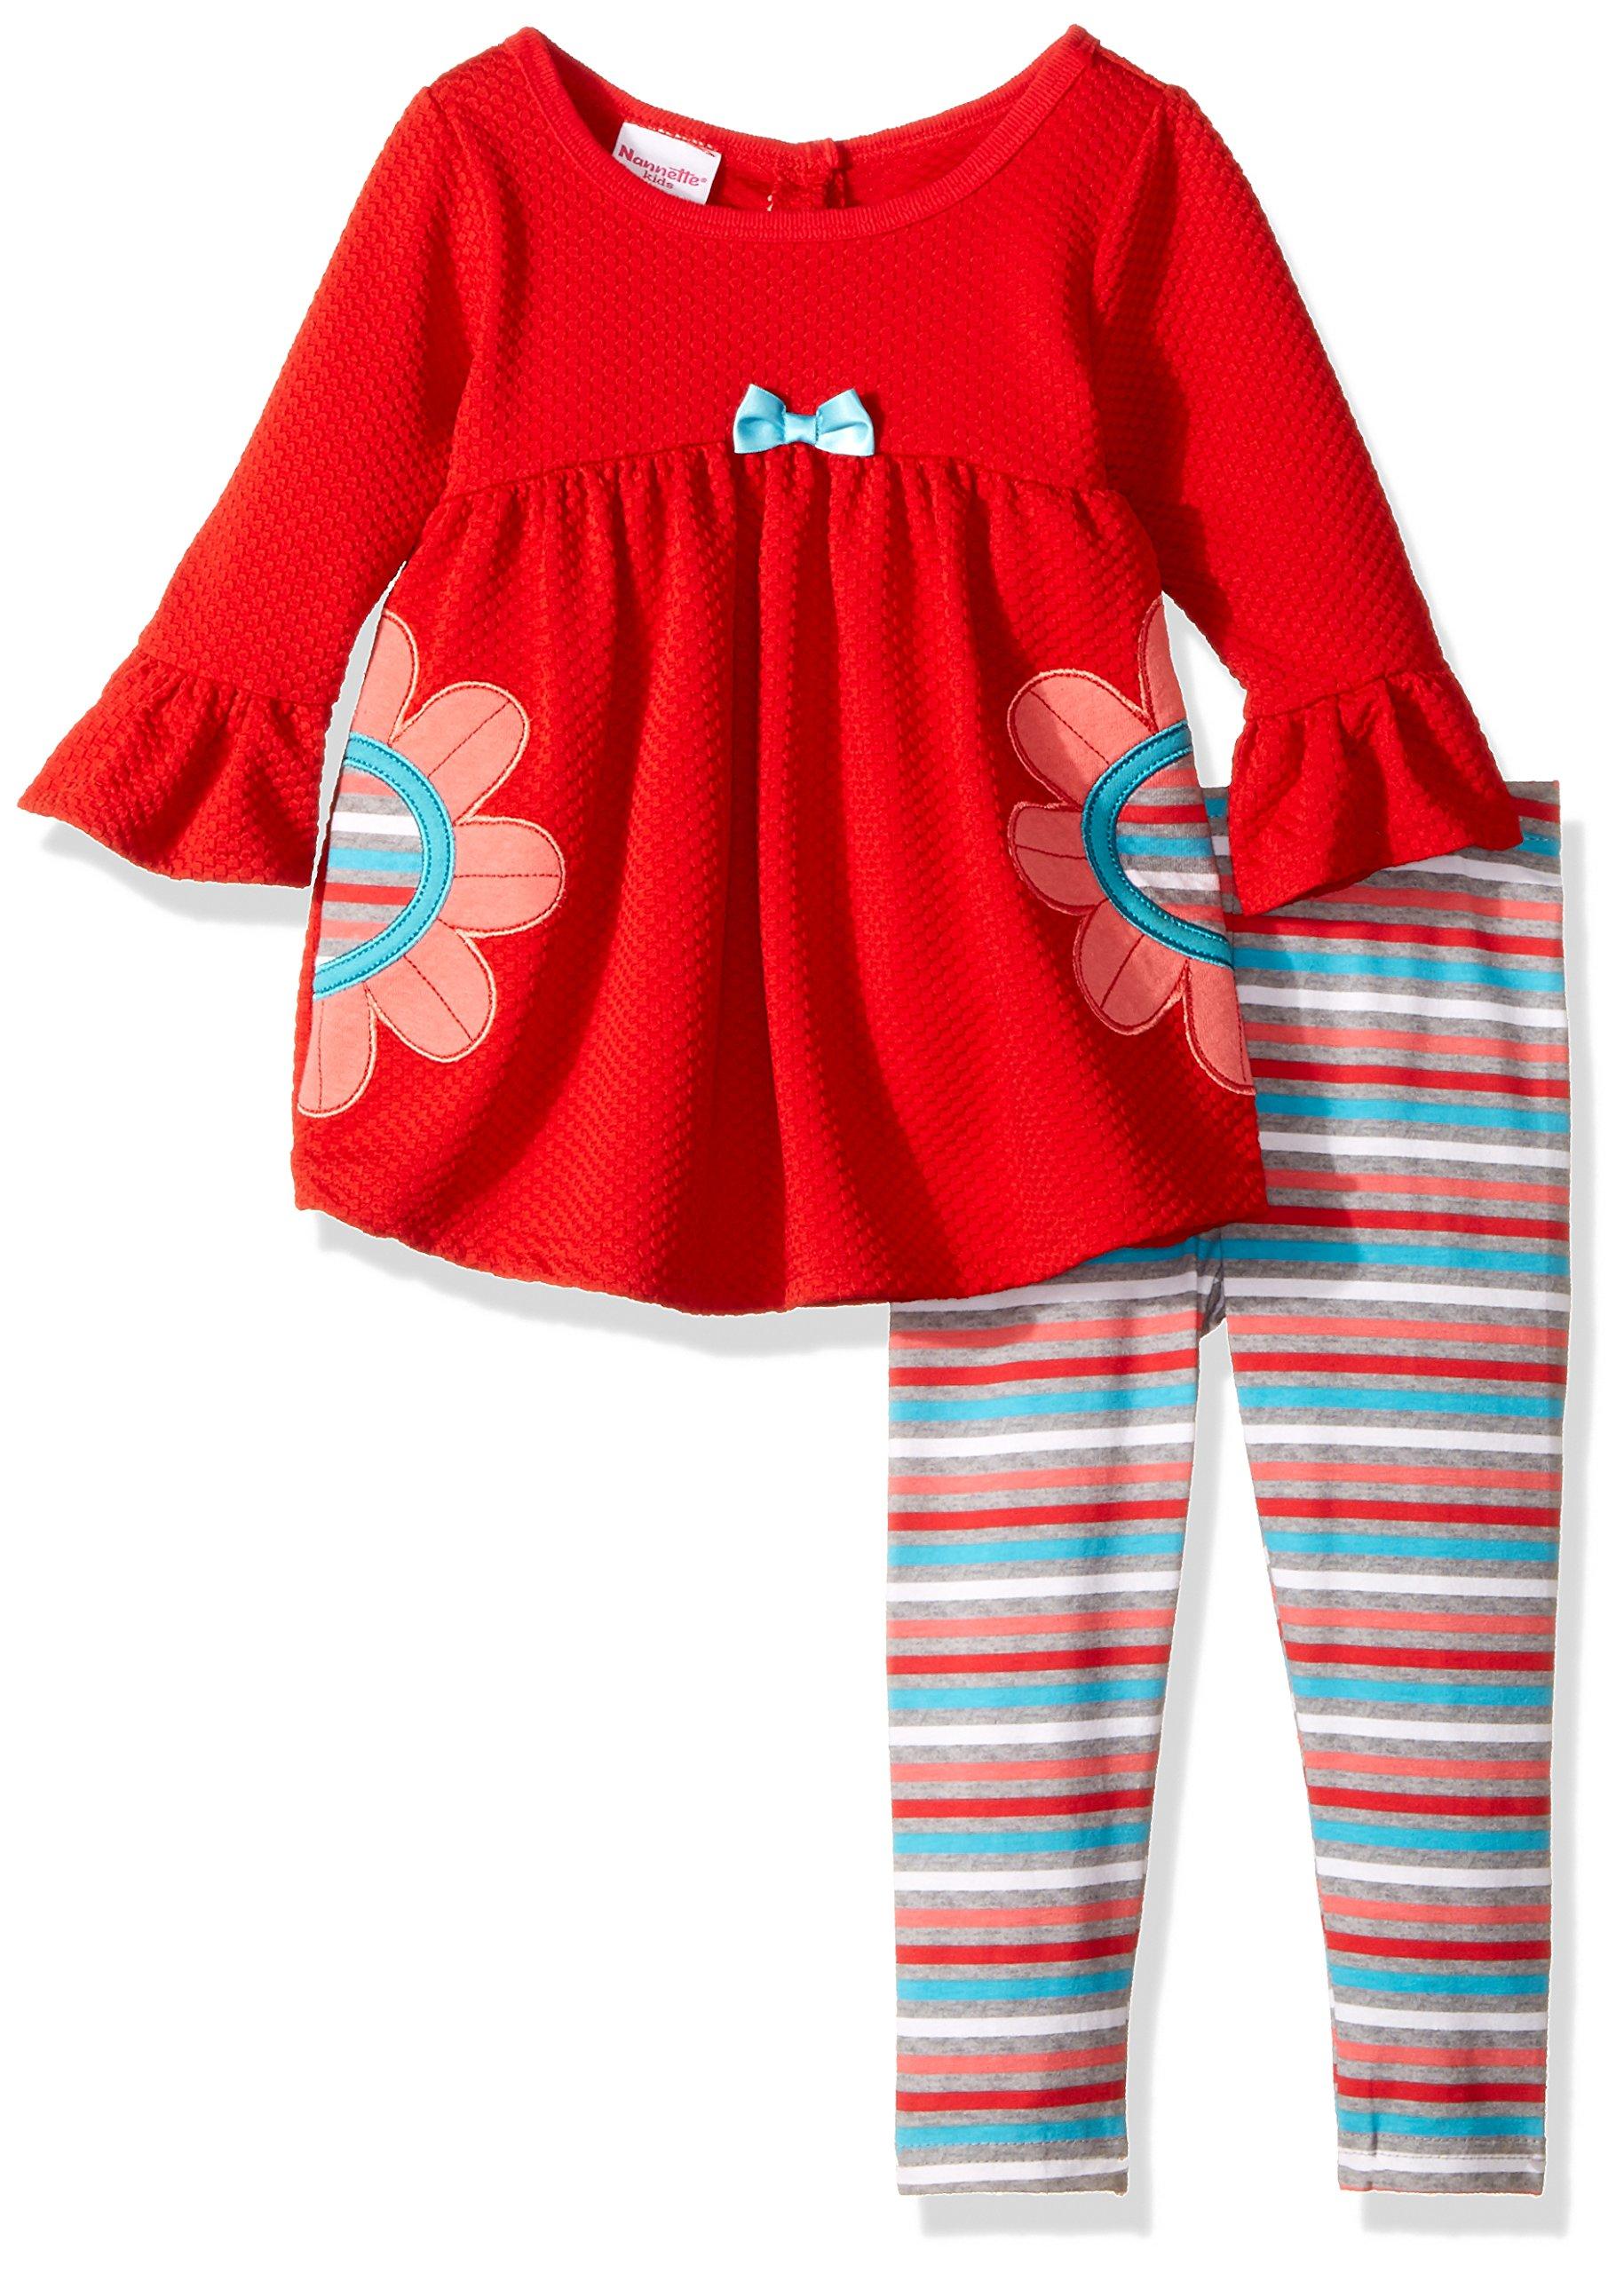 Nannette Baby Girls' Playwear Long Sleeve Top and Legging Set, Flower Red, 18m